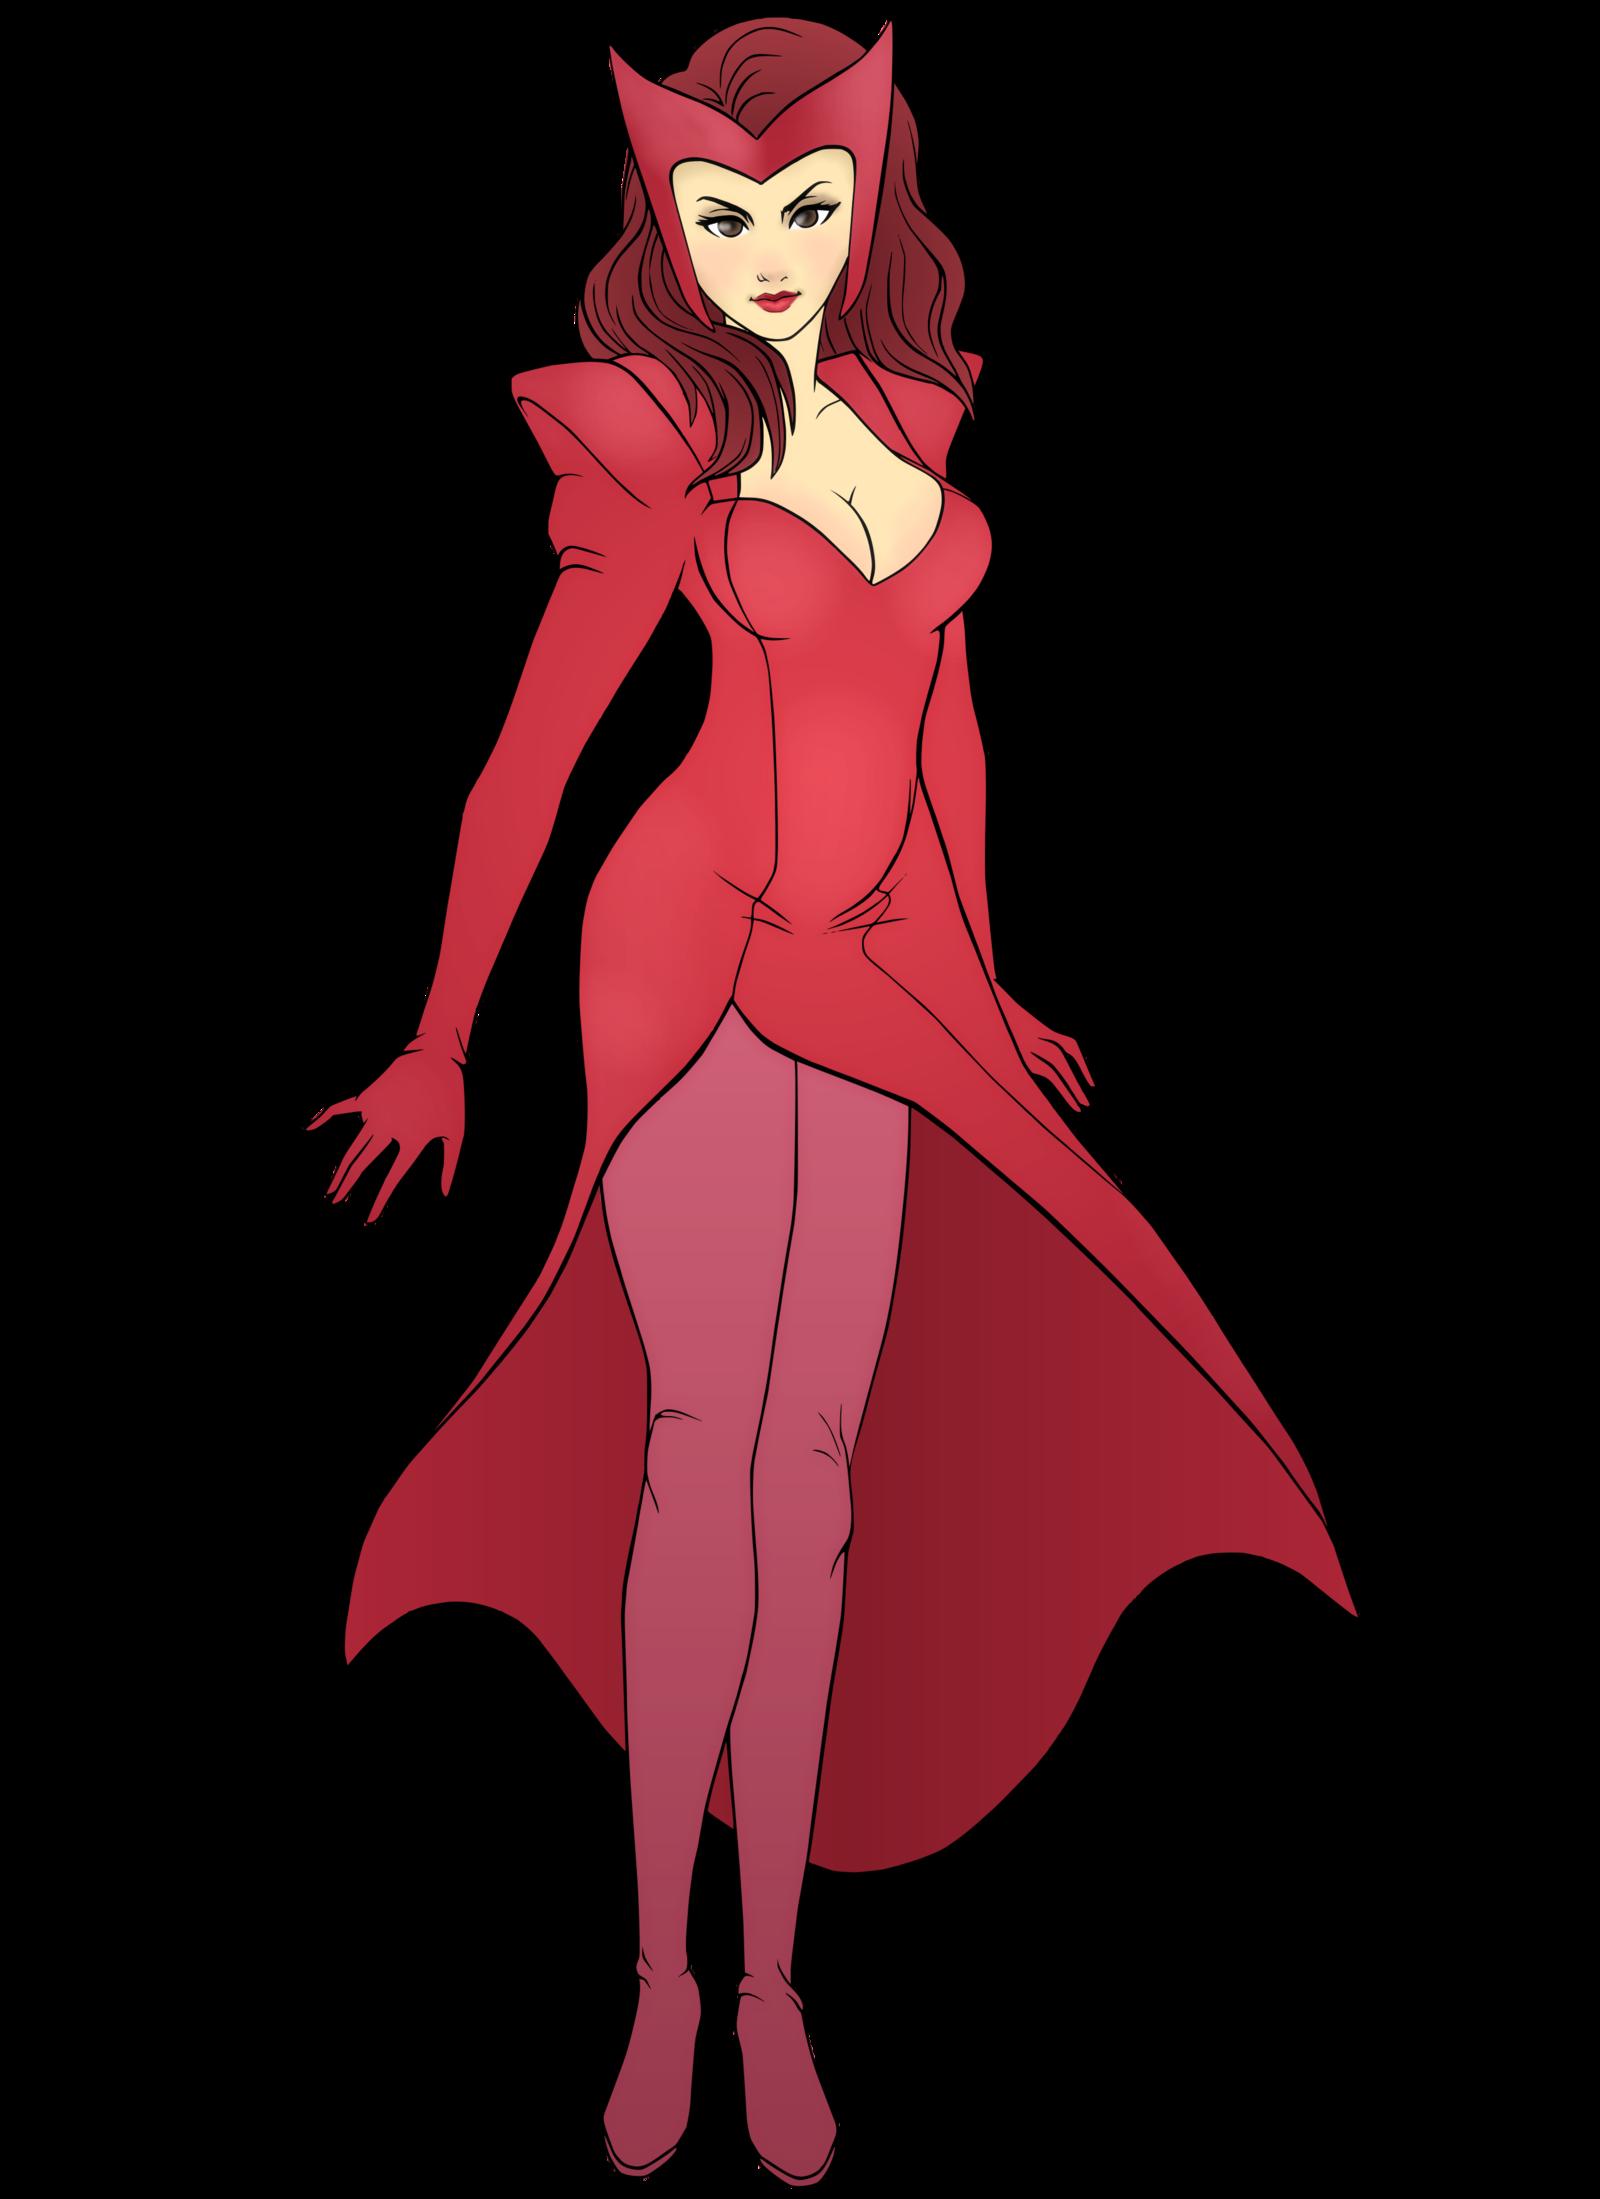 Scarlet cliparts.